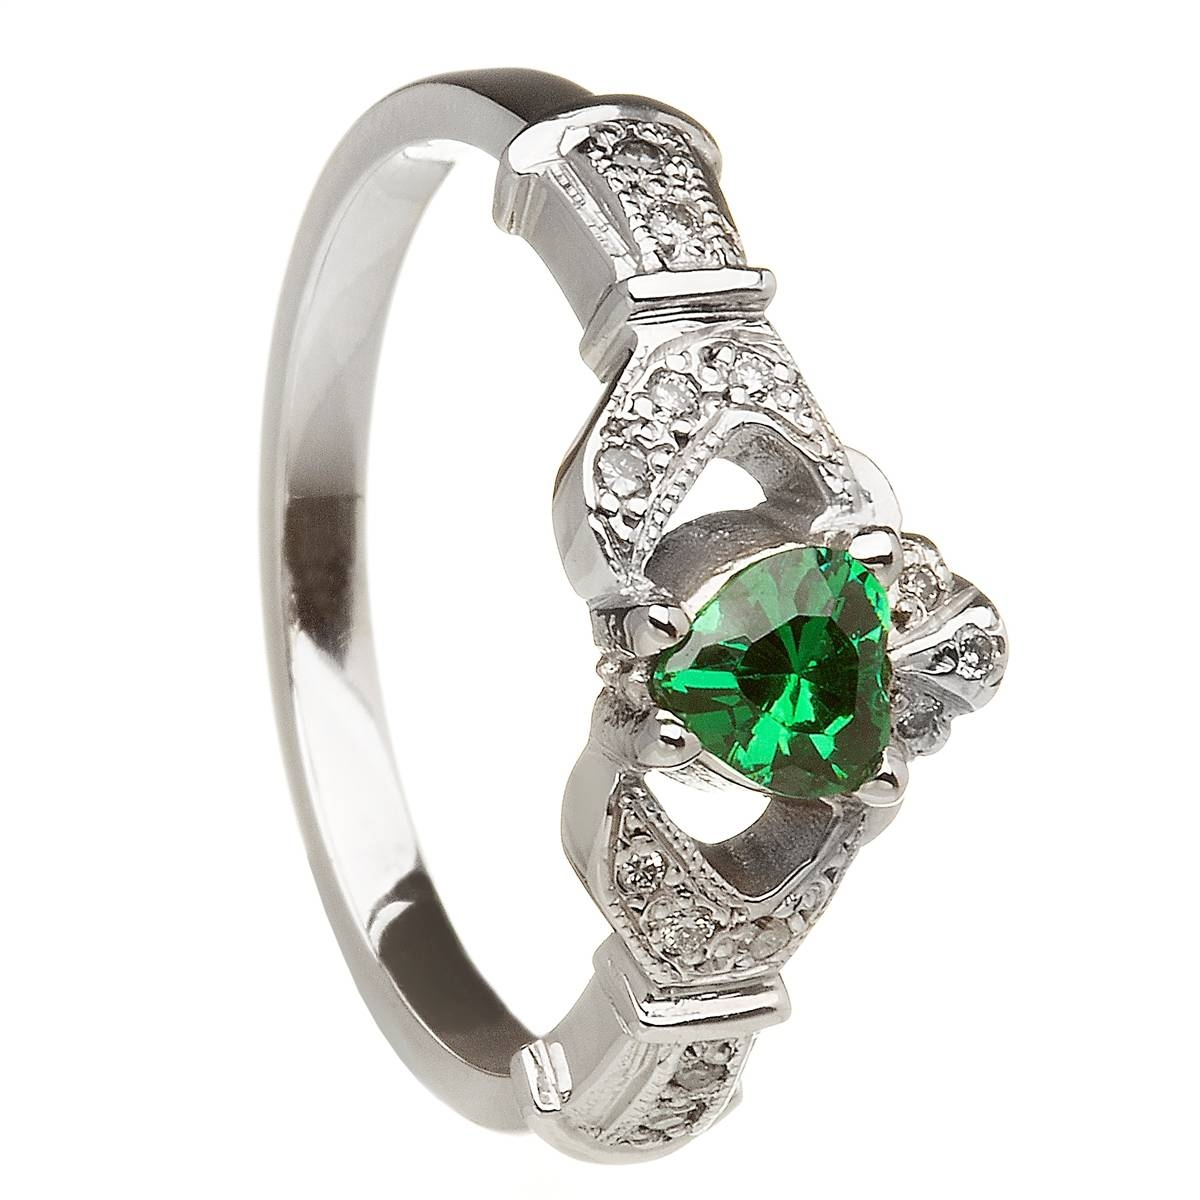 set heart claddagh ring & wedding ring set with regard to cladda